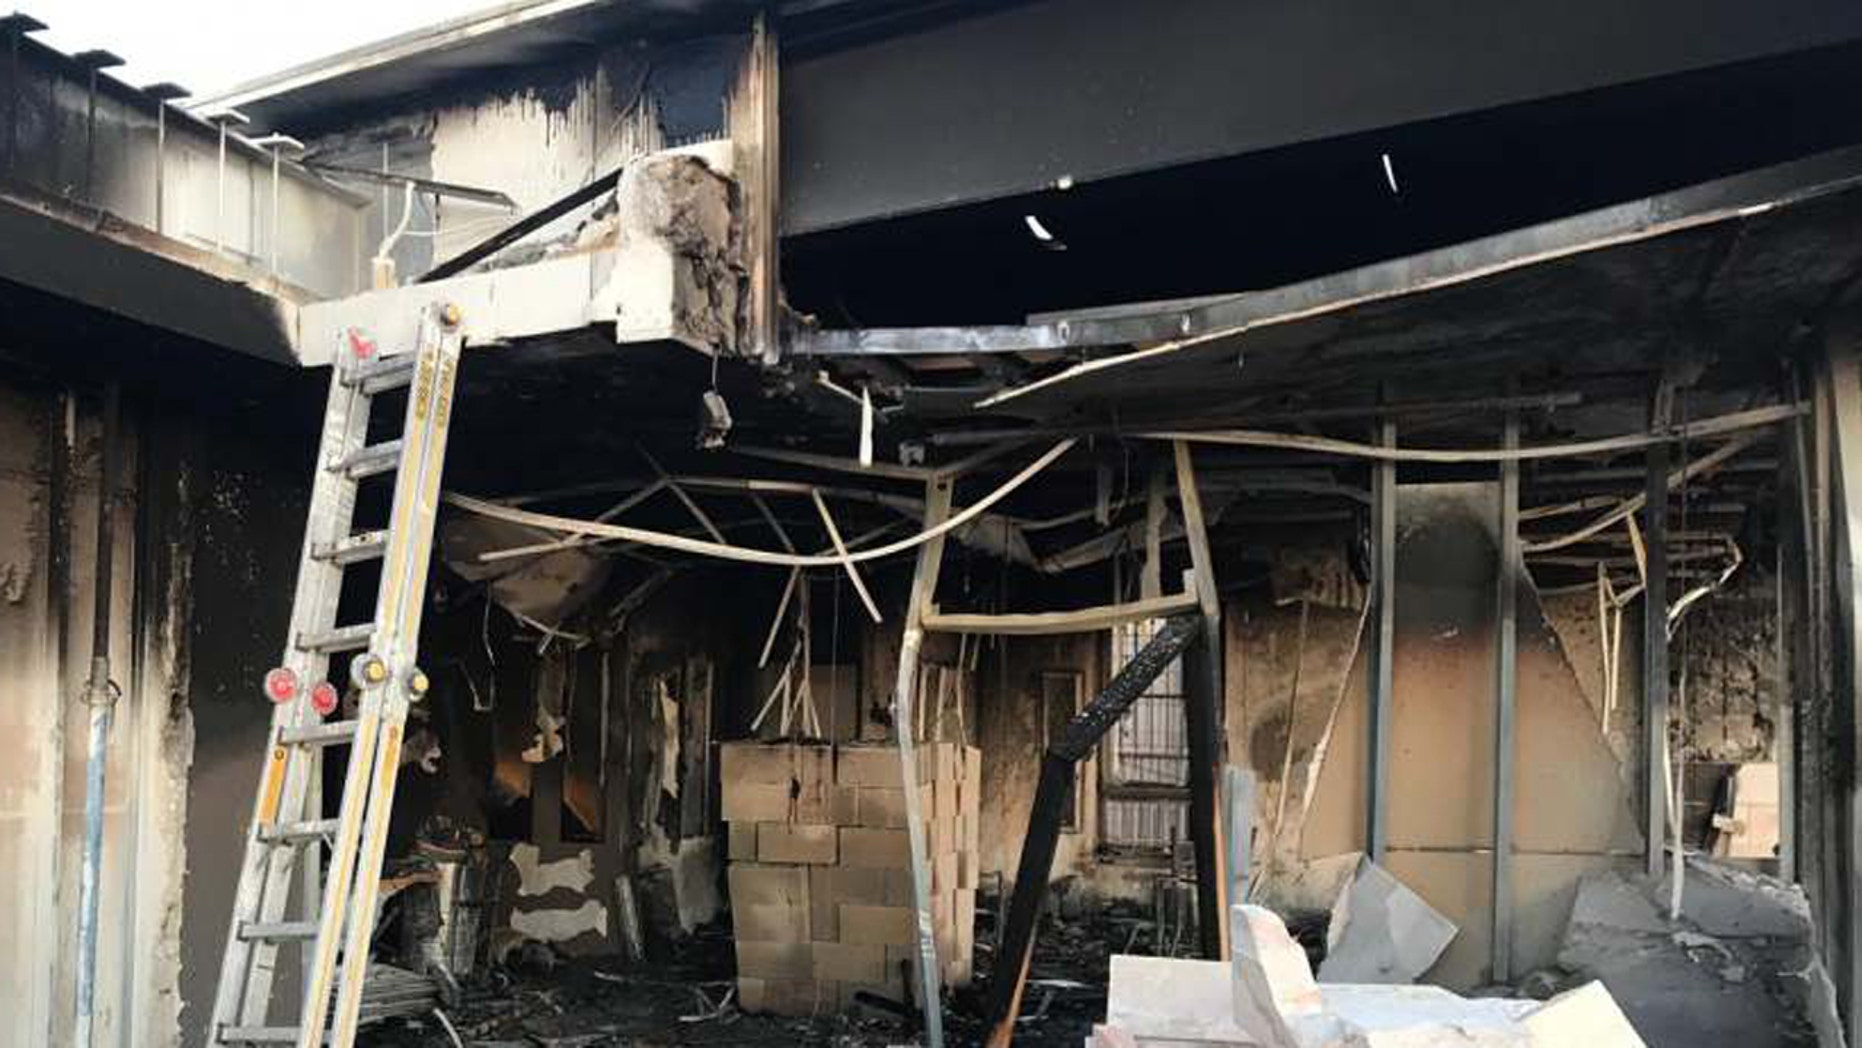 Daystar Television Network's Jerusalem studio was firebombed late Friday night.